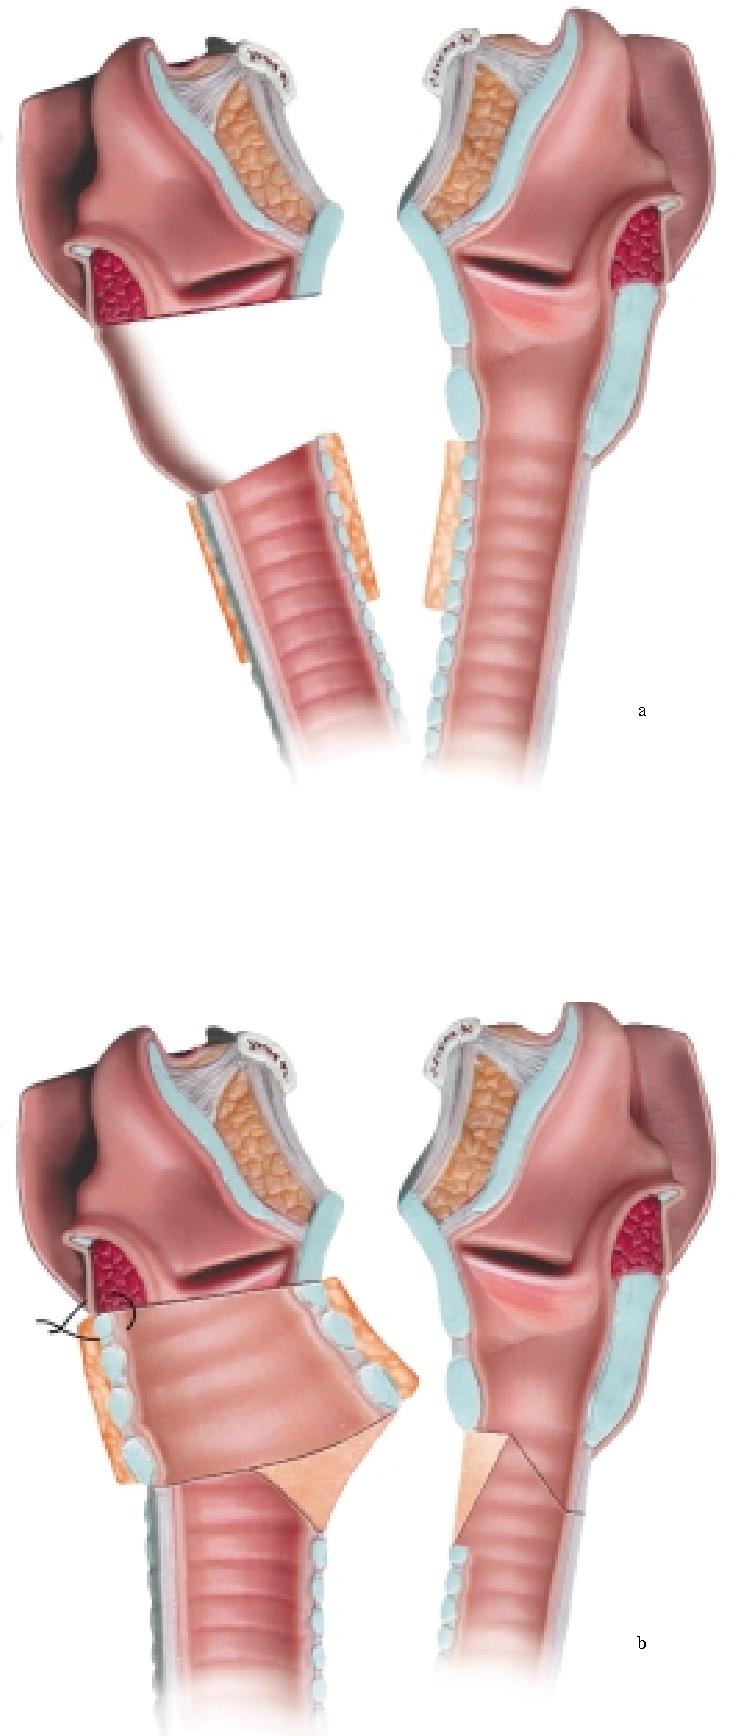 figure 5.51